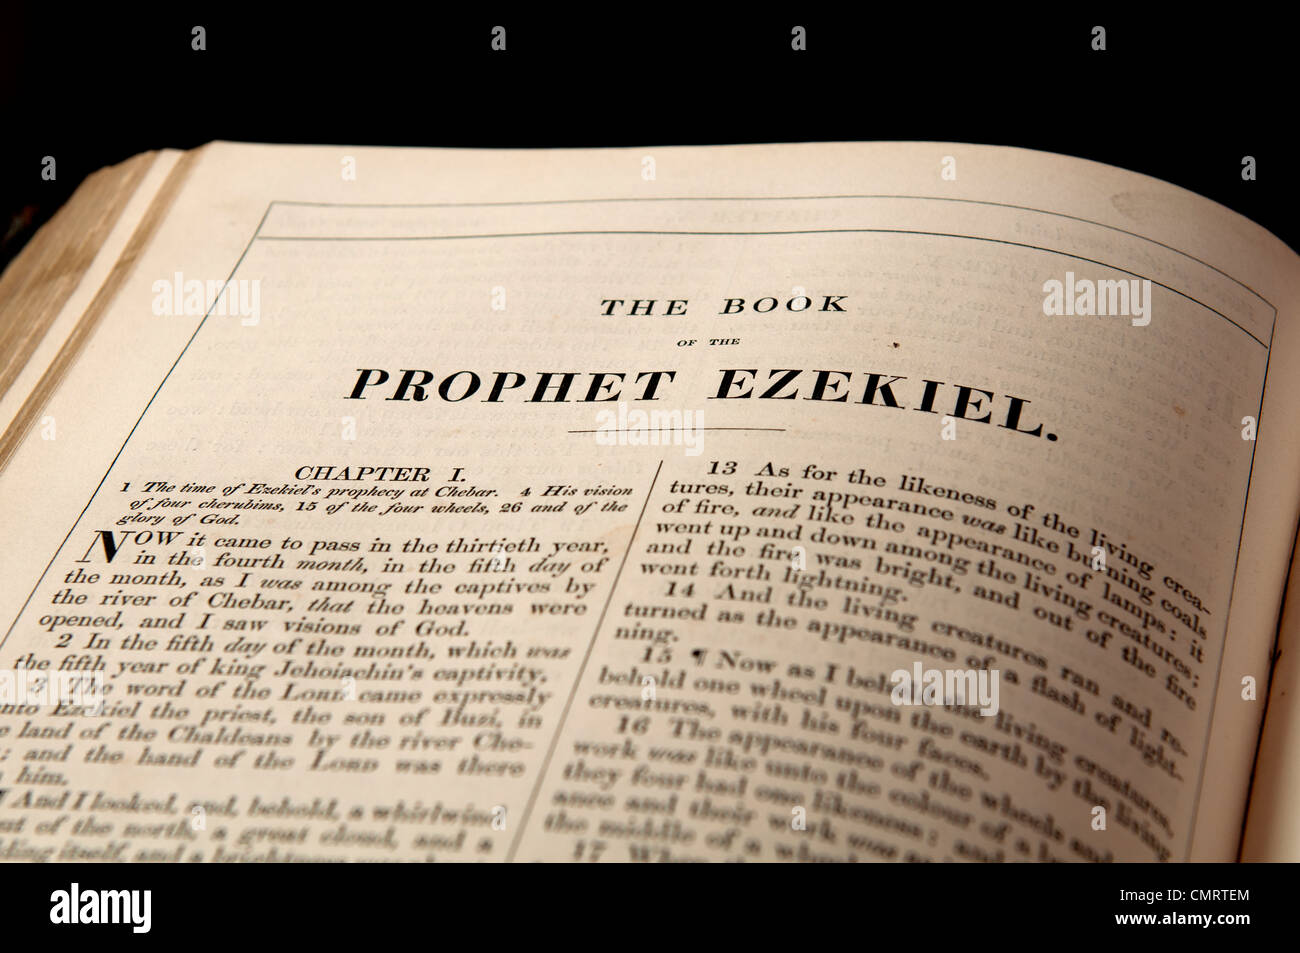 The Book of the Prophet Ezekiel in the Bible - Stock Image